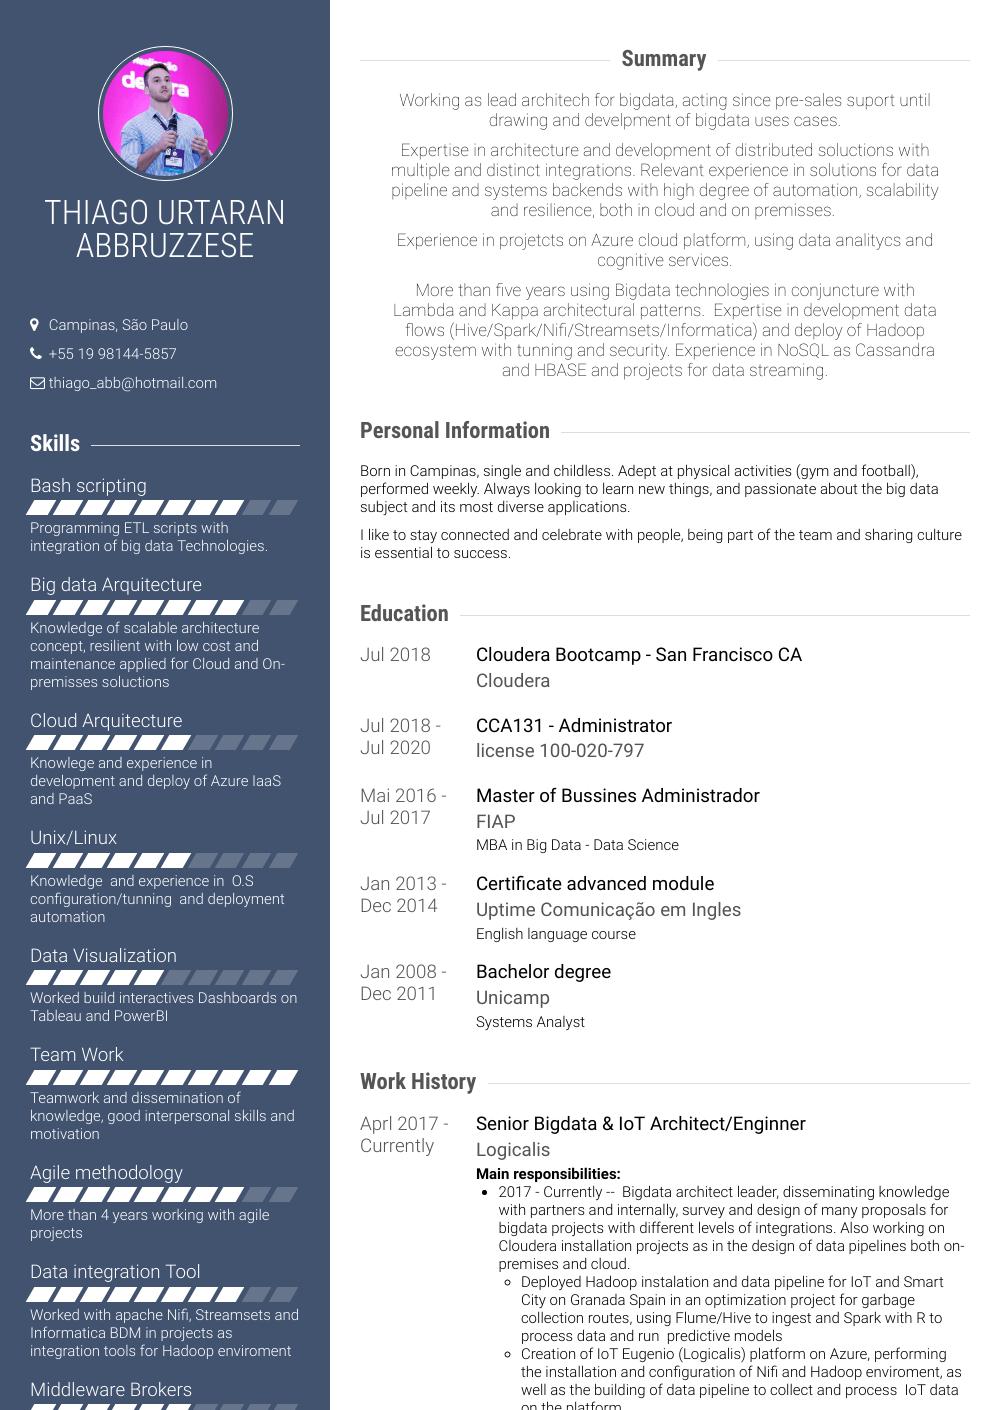 Systems Engineer - Resume Samples & Templates | VisualCV